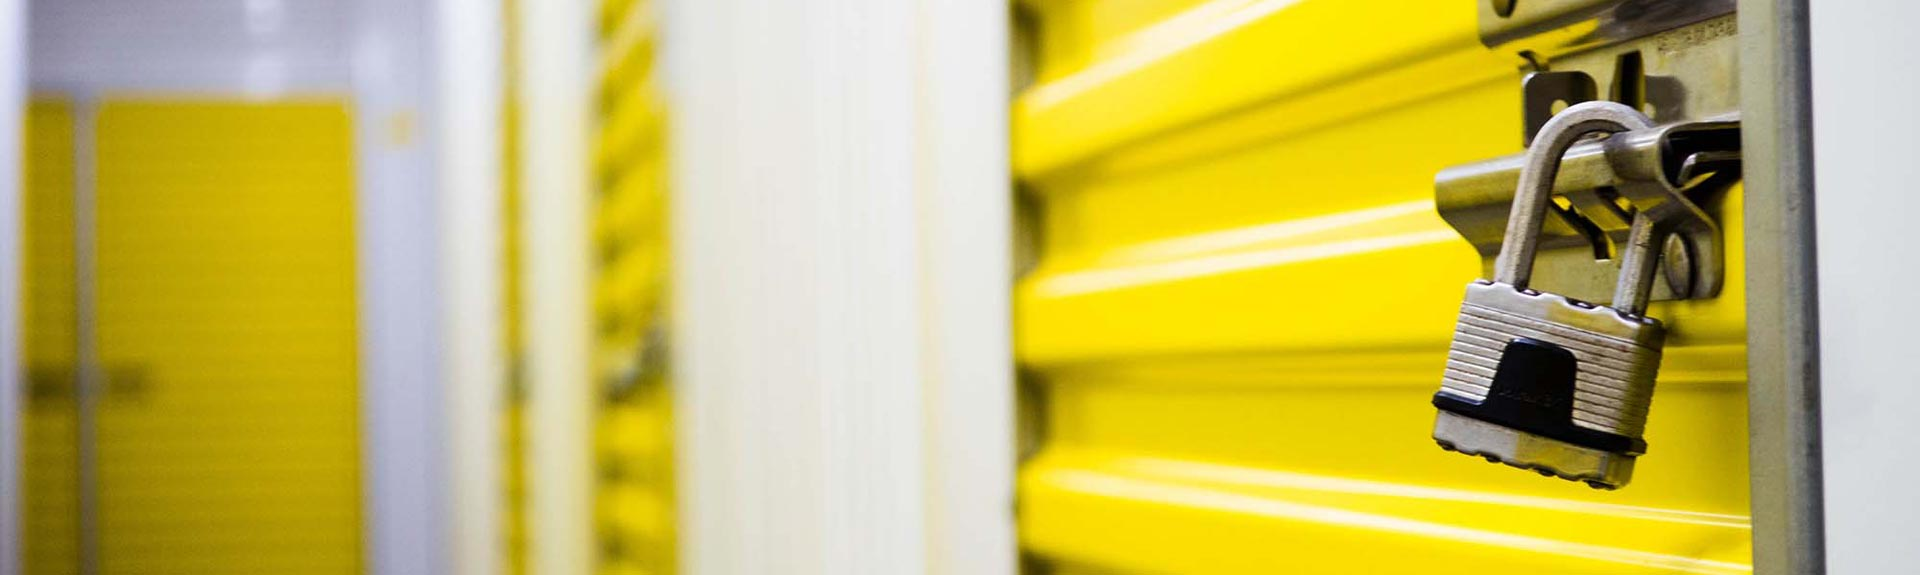 Smart Storage facilities image.